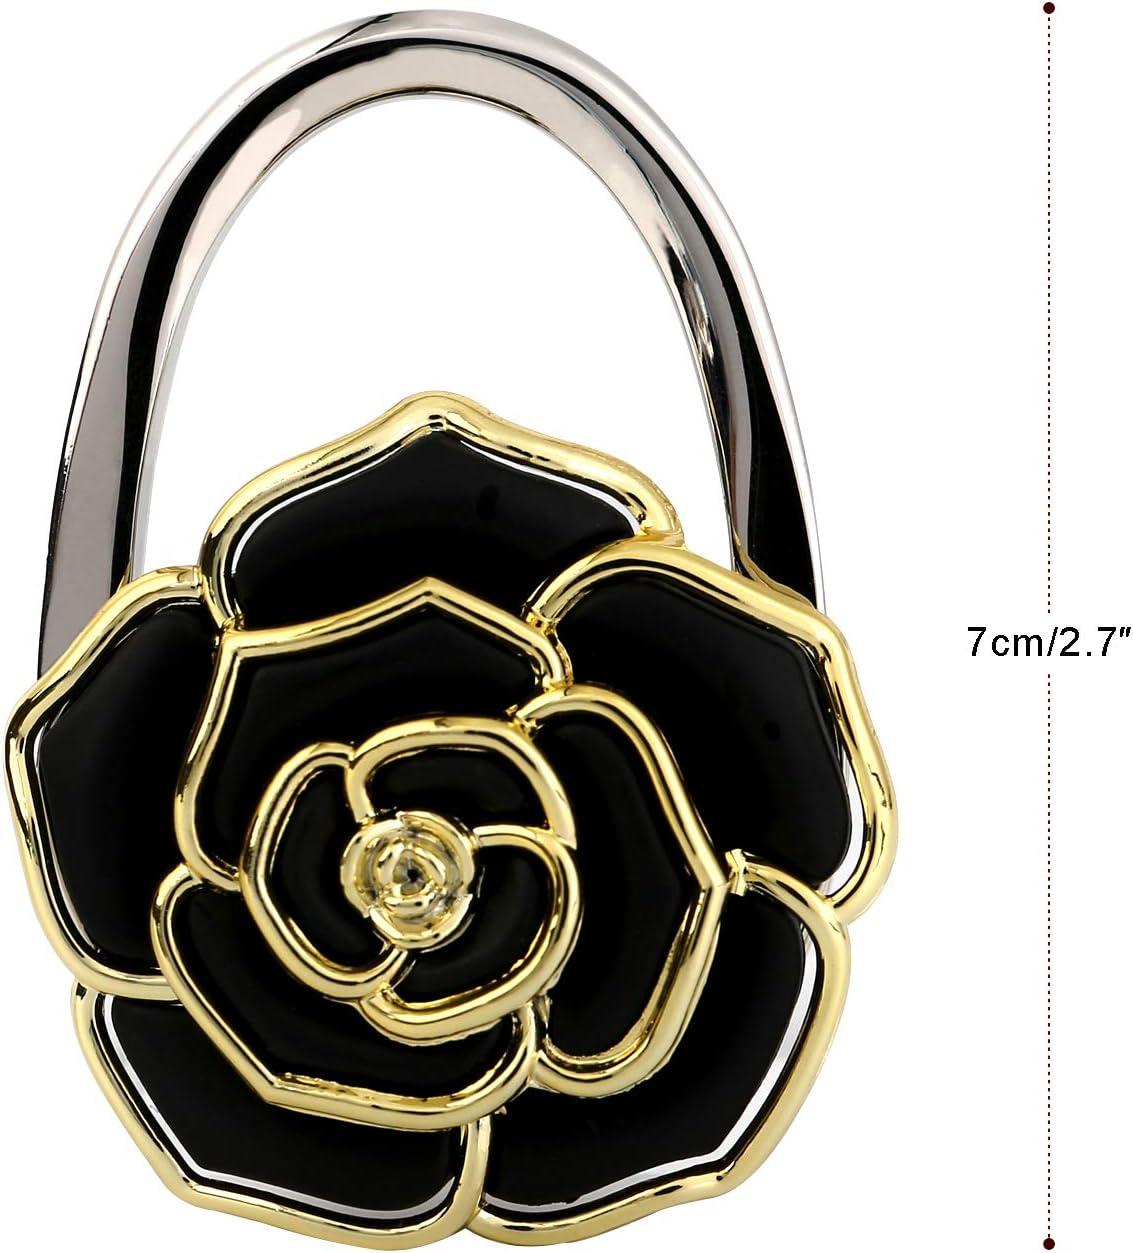 Portable Folding Handbag Hanger Women/'s Bag Holder Lady Charm Handbag Wallet Purse with Rose-Shape Handbag Holder for Table Desk OOTSR Foldable Handbag Hanger Purse Hook with Cleaning Cloth